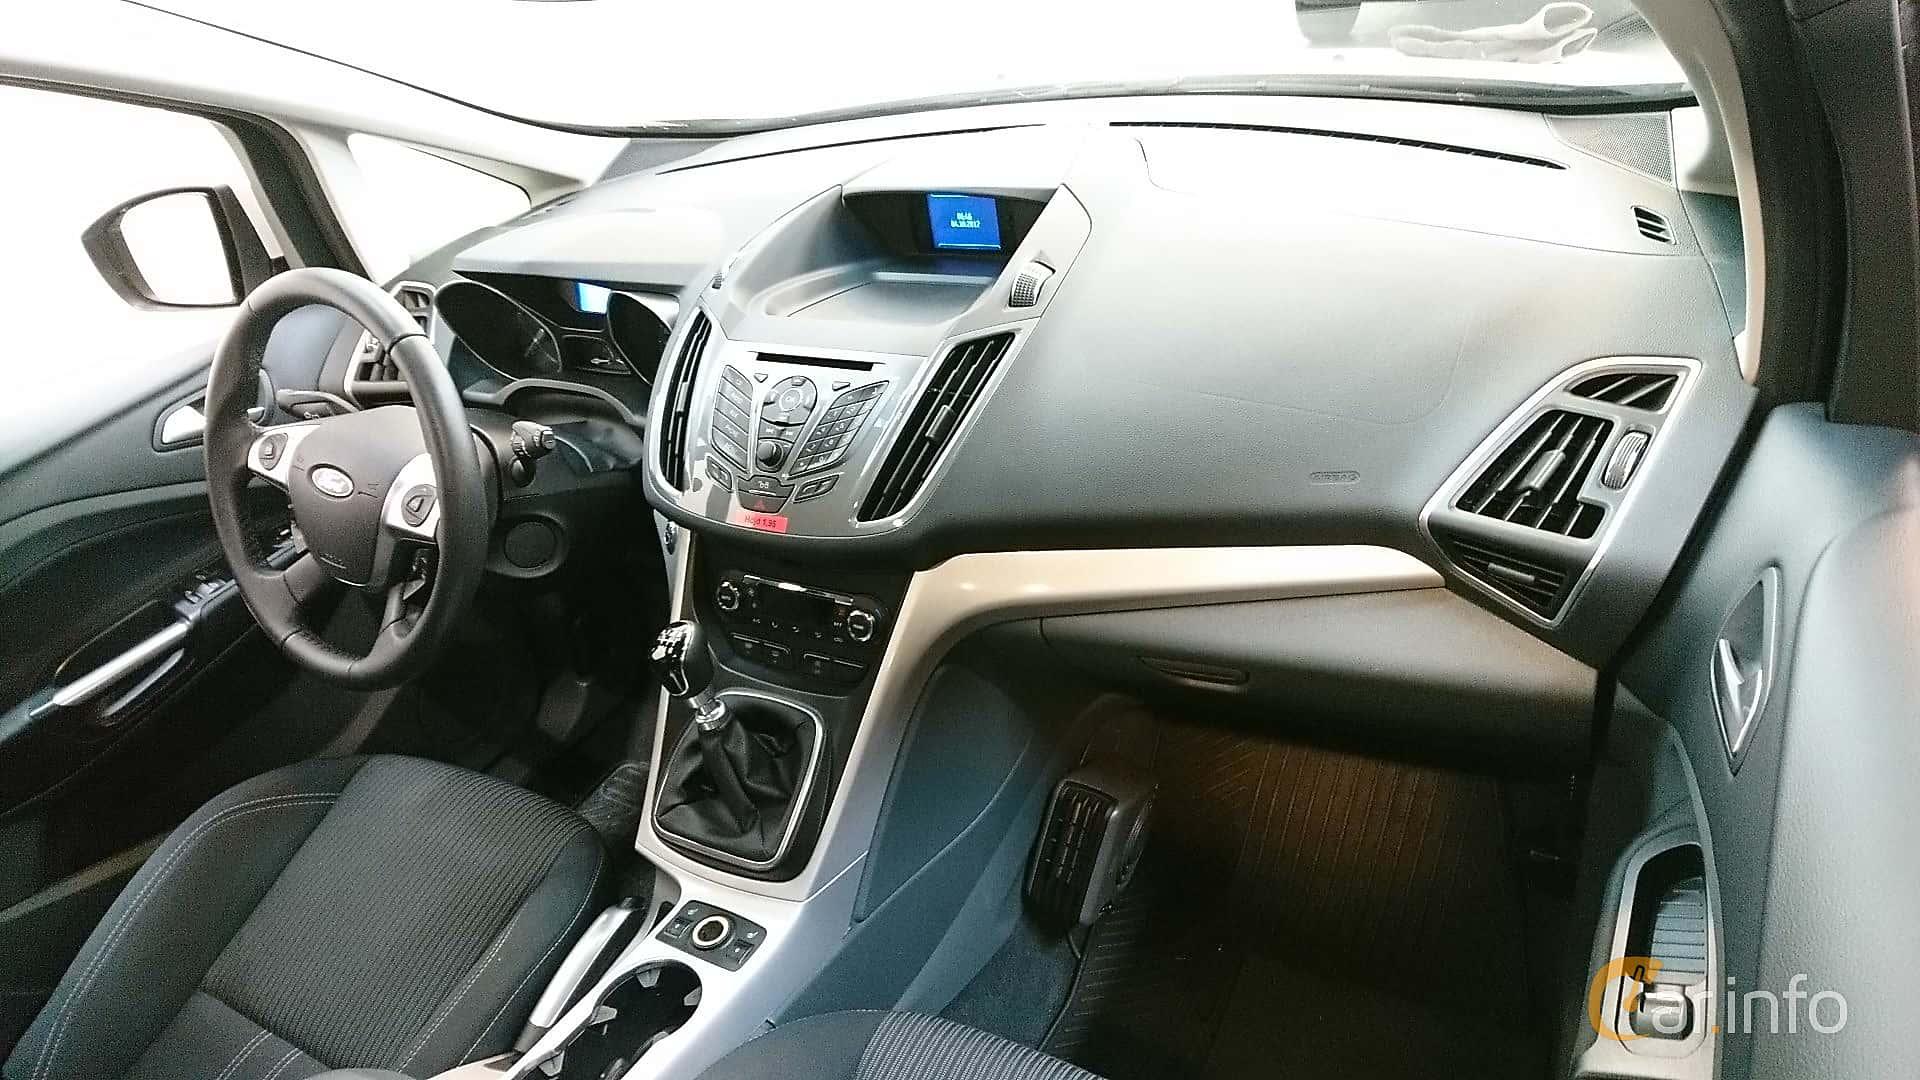 ford-c-max-interior-2-499143.jpg